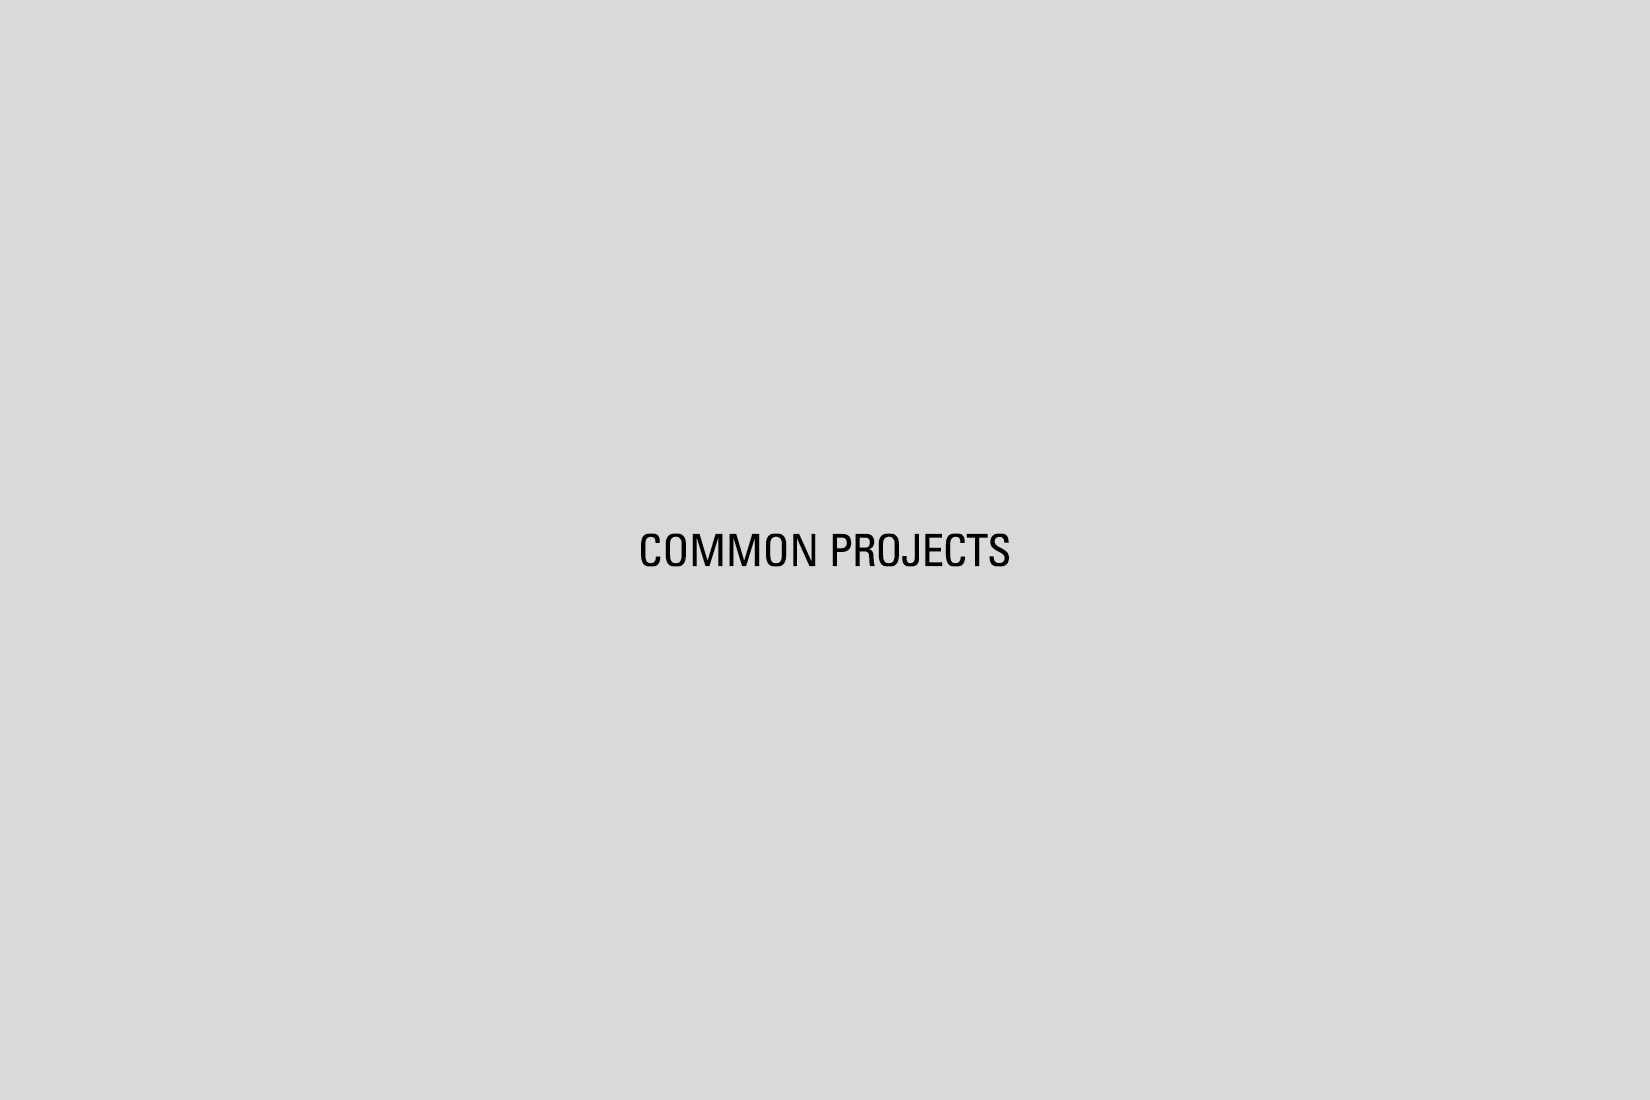 common project skor